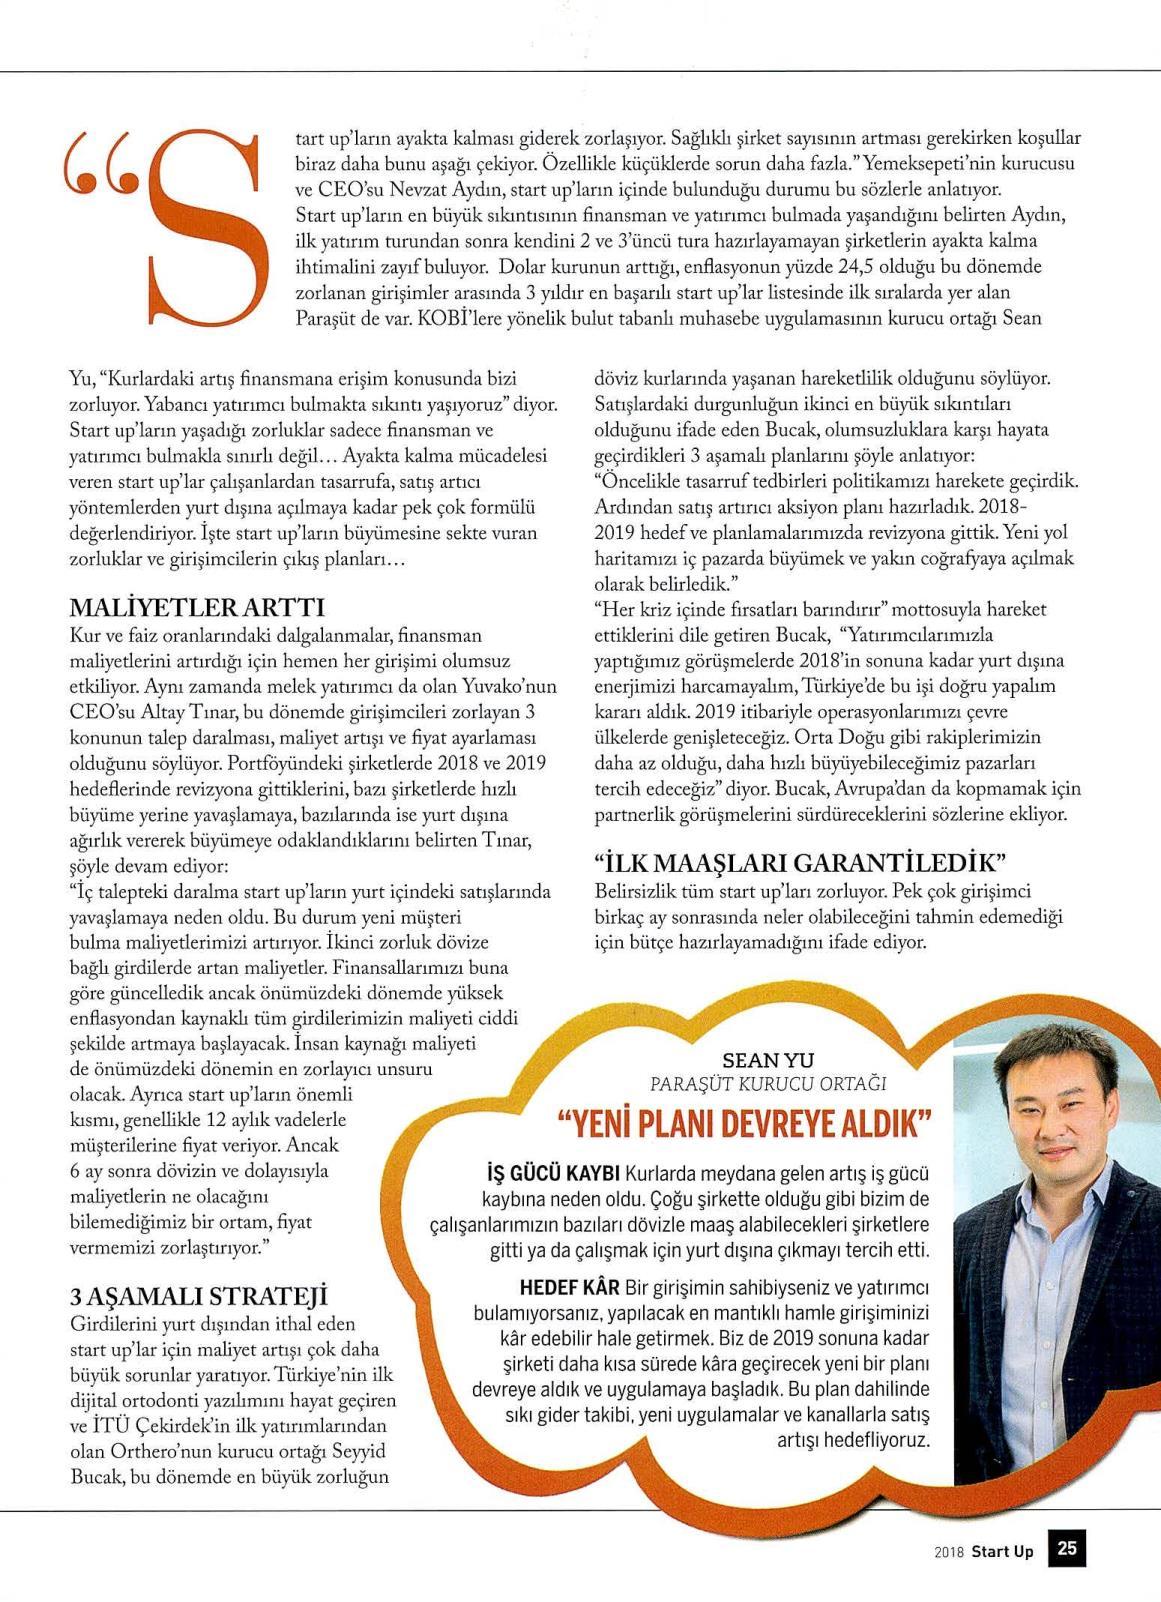 Capital_Start Up Dergisi_Kasım 2018_4